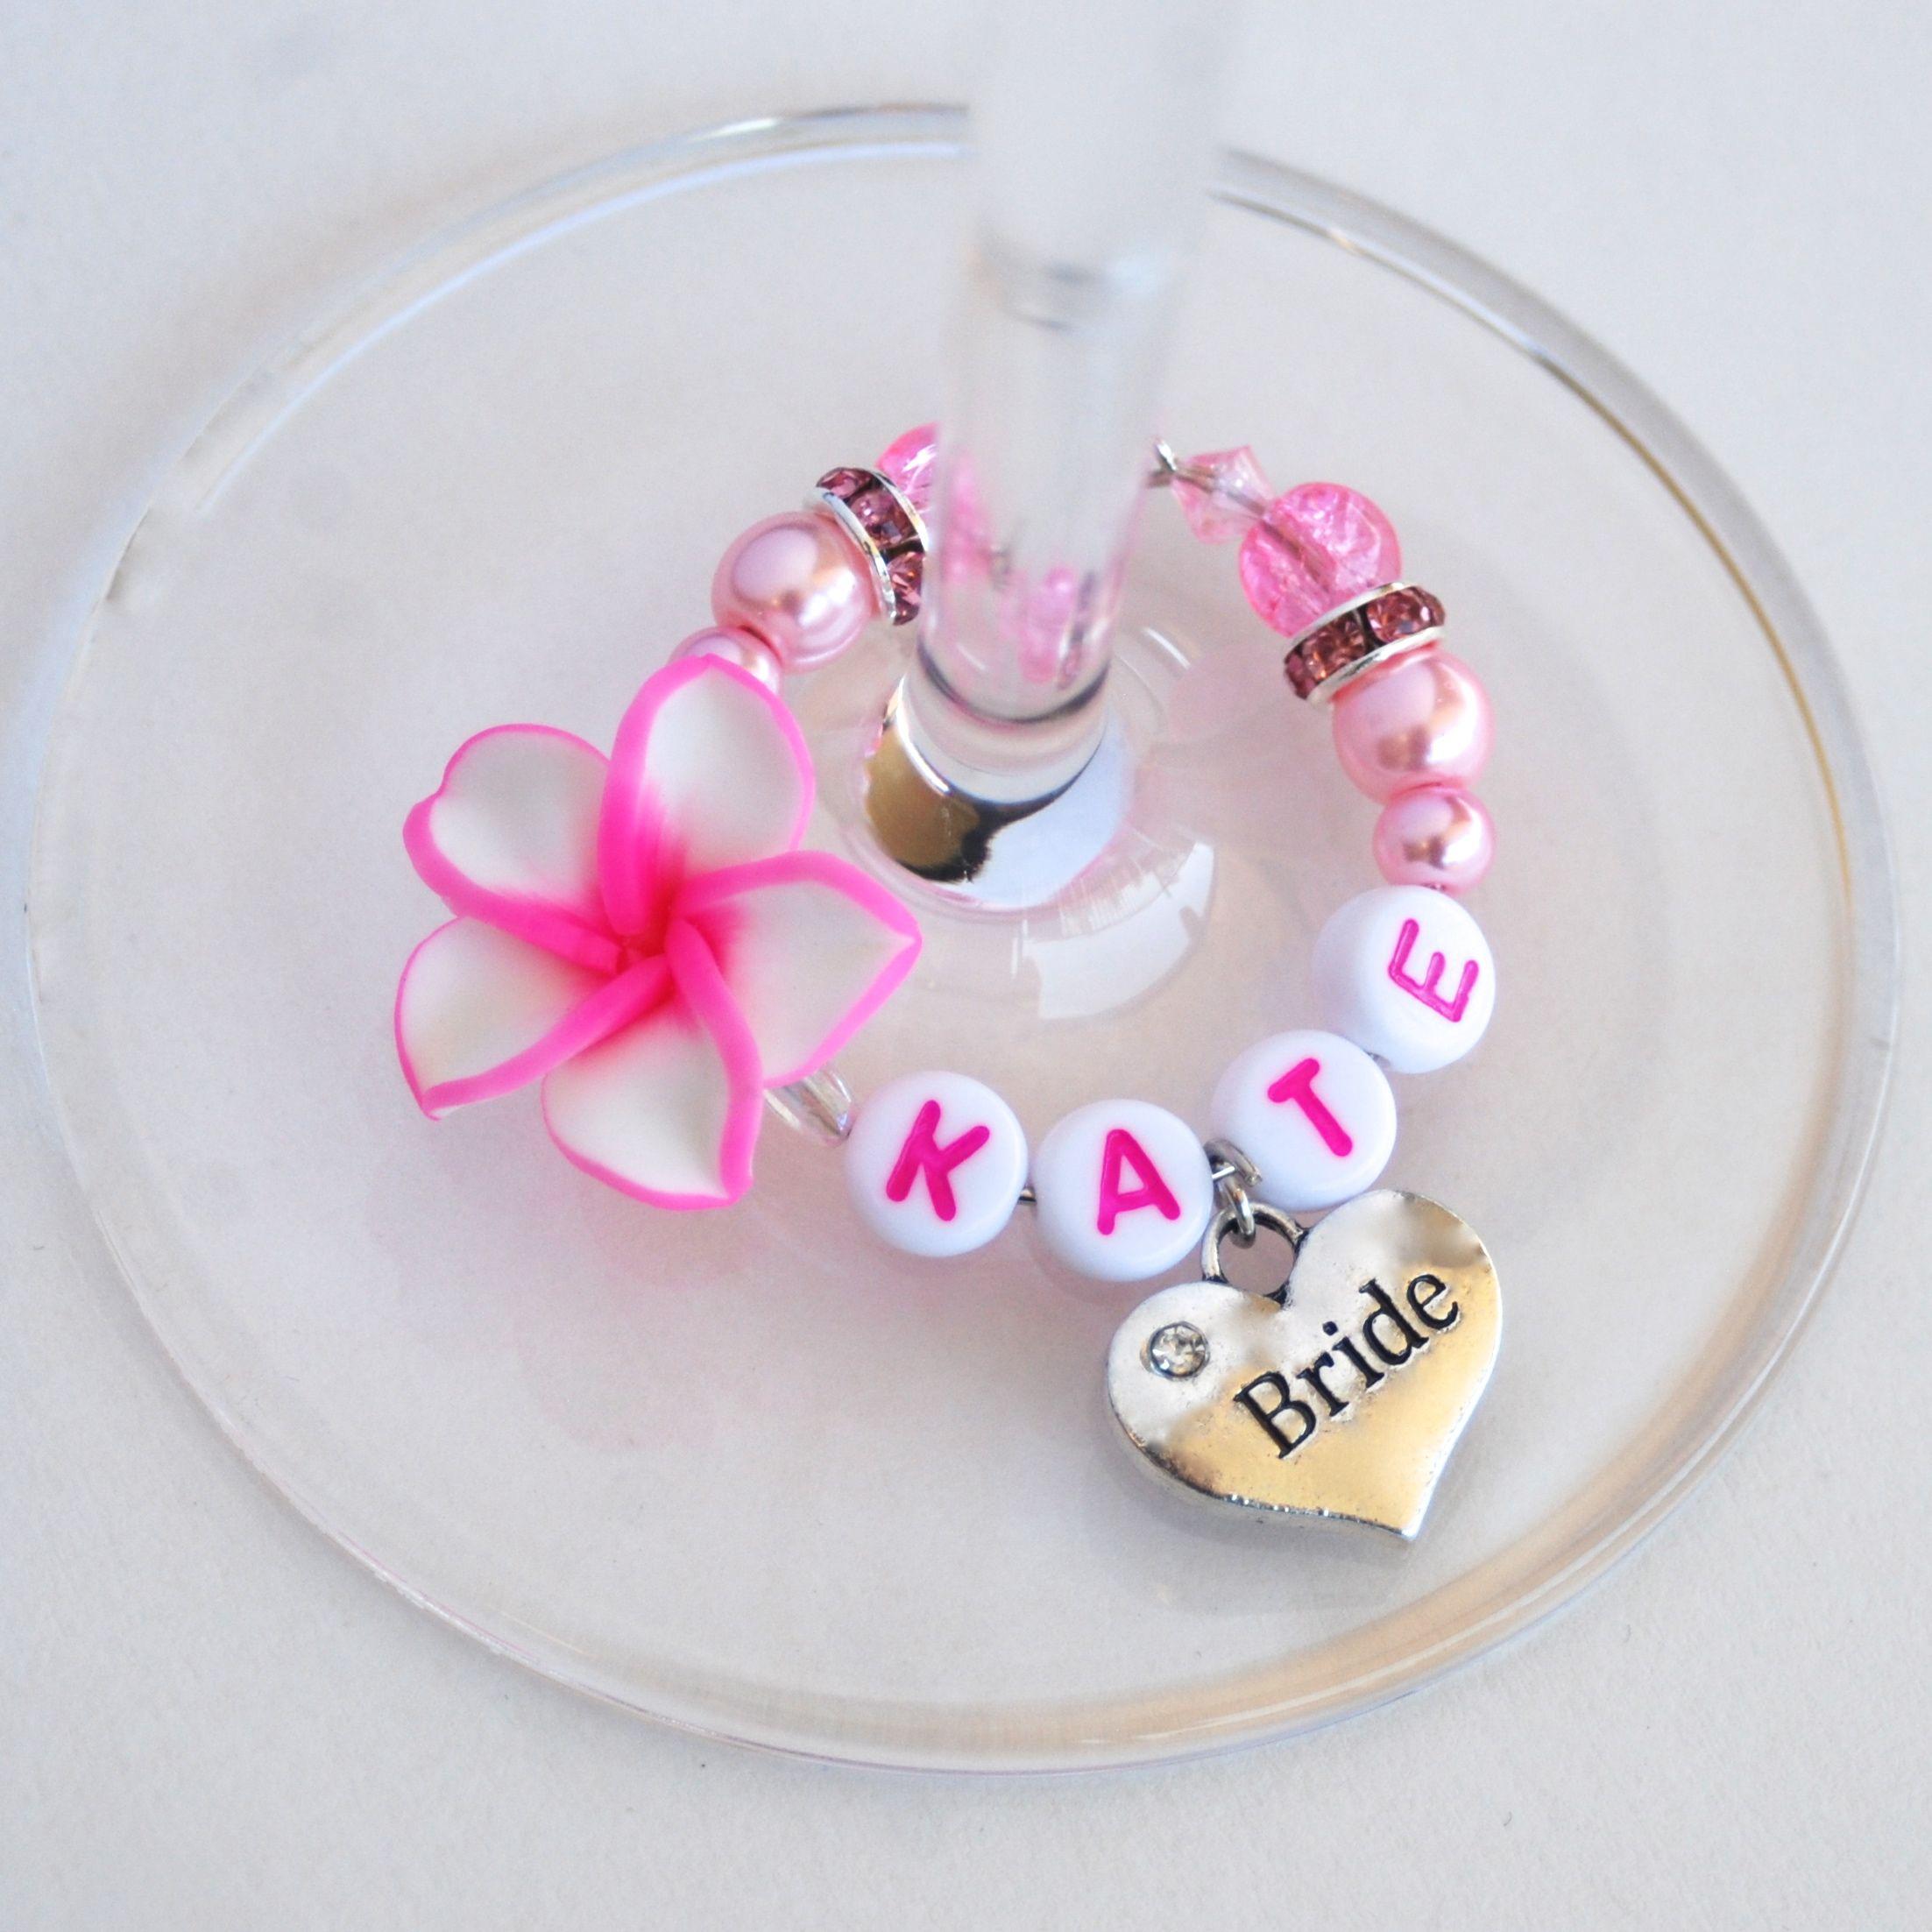 Frangipani Wedding Heart Deluxe | Pinterest | Color themes, Weddings ...